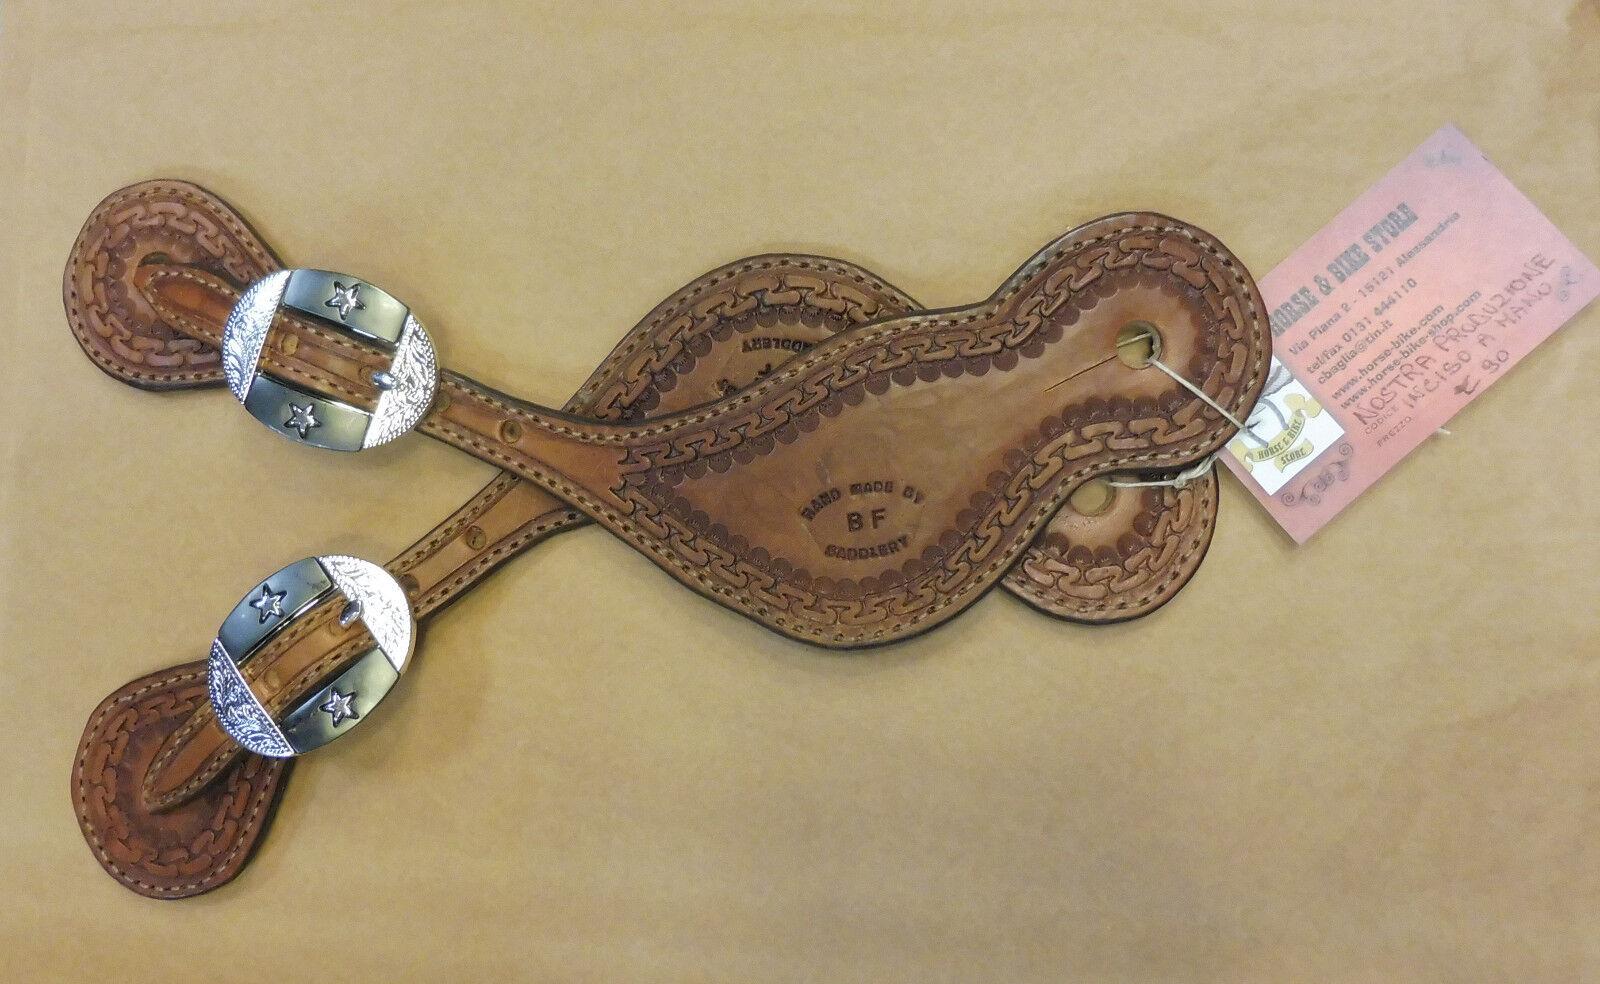 Cinturini porta speroni western incisi a mano cuoio platai texas star